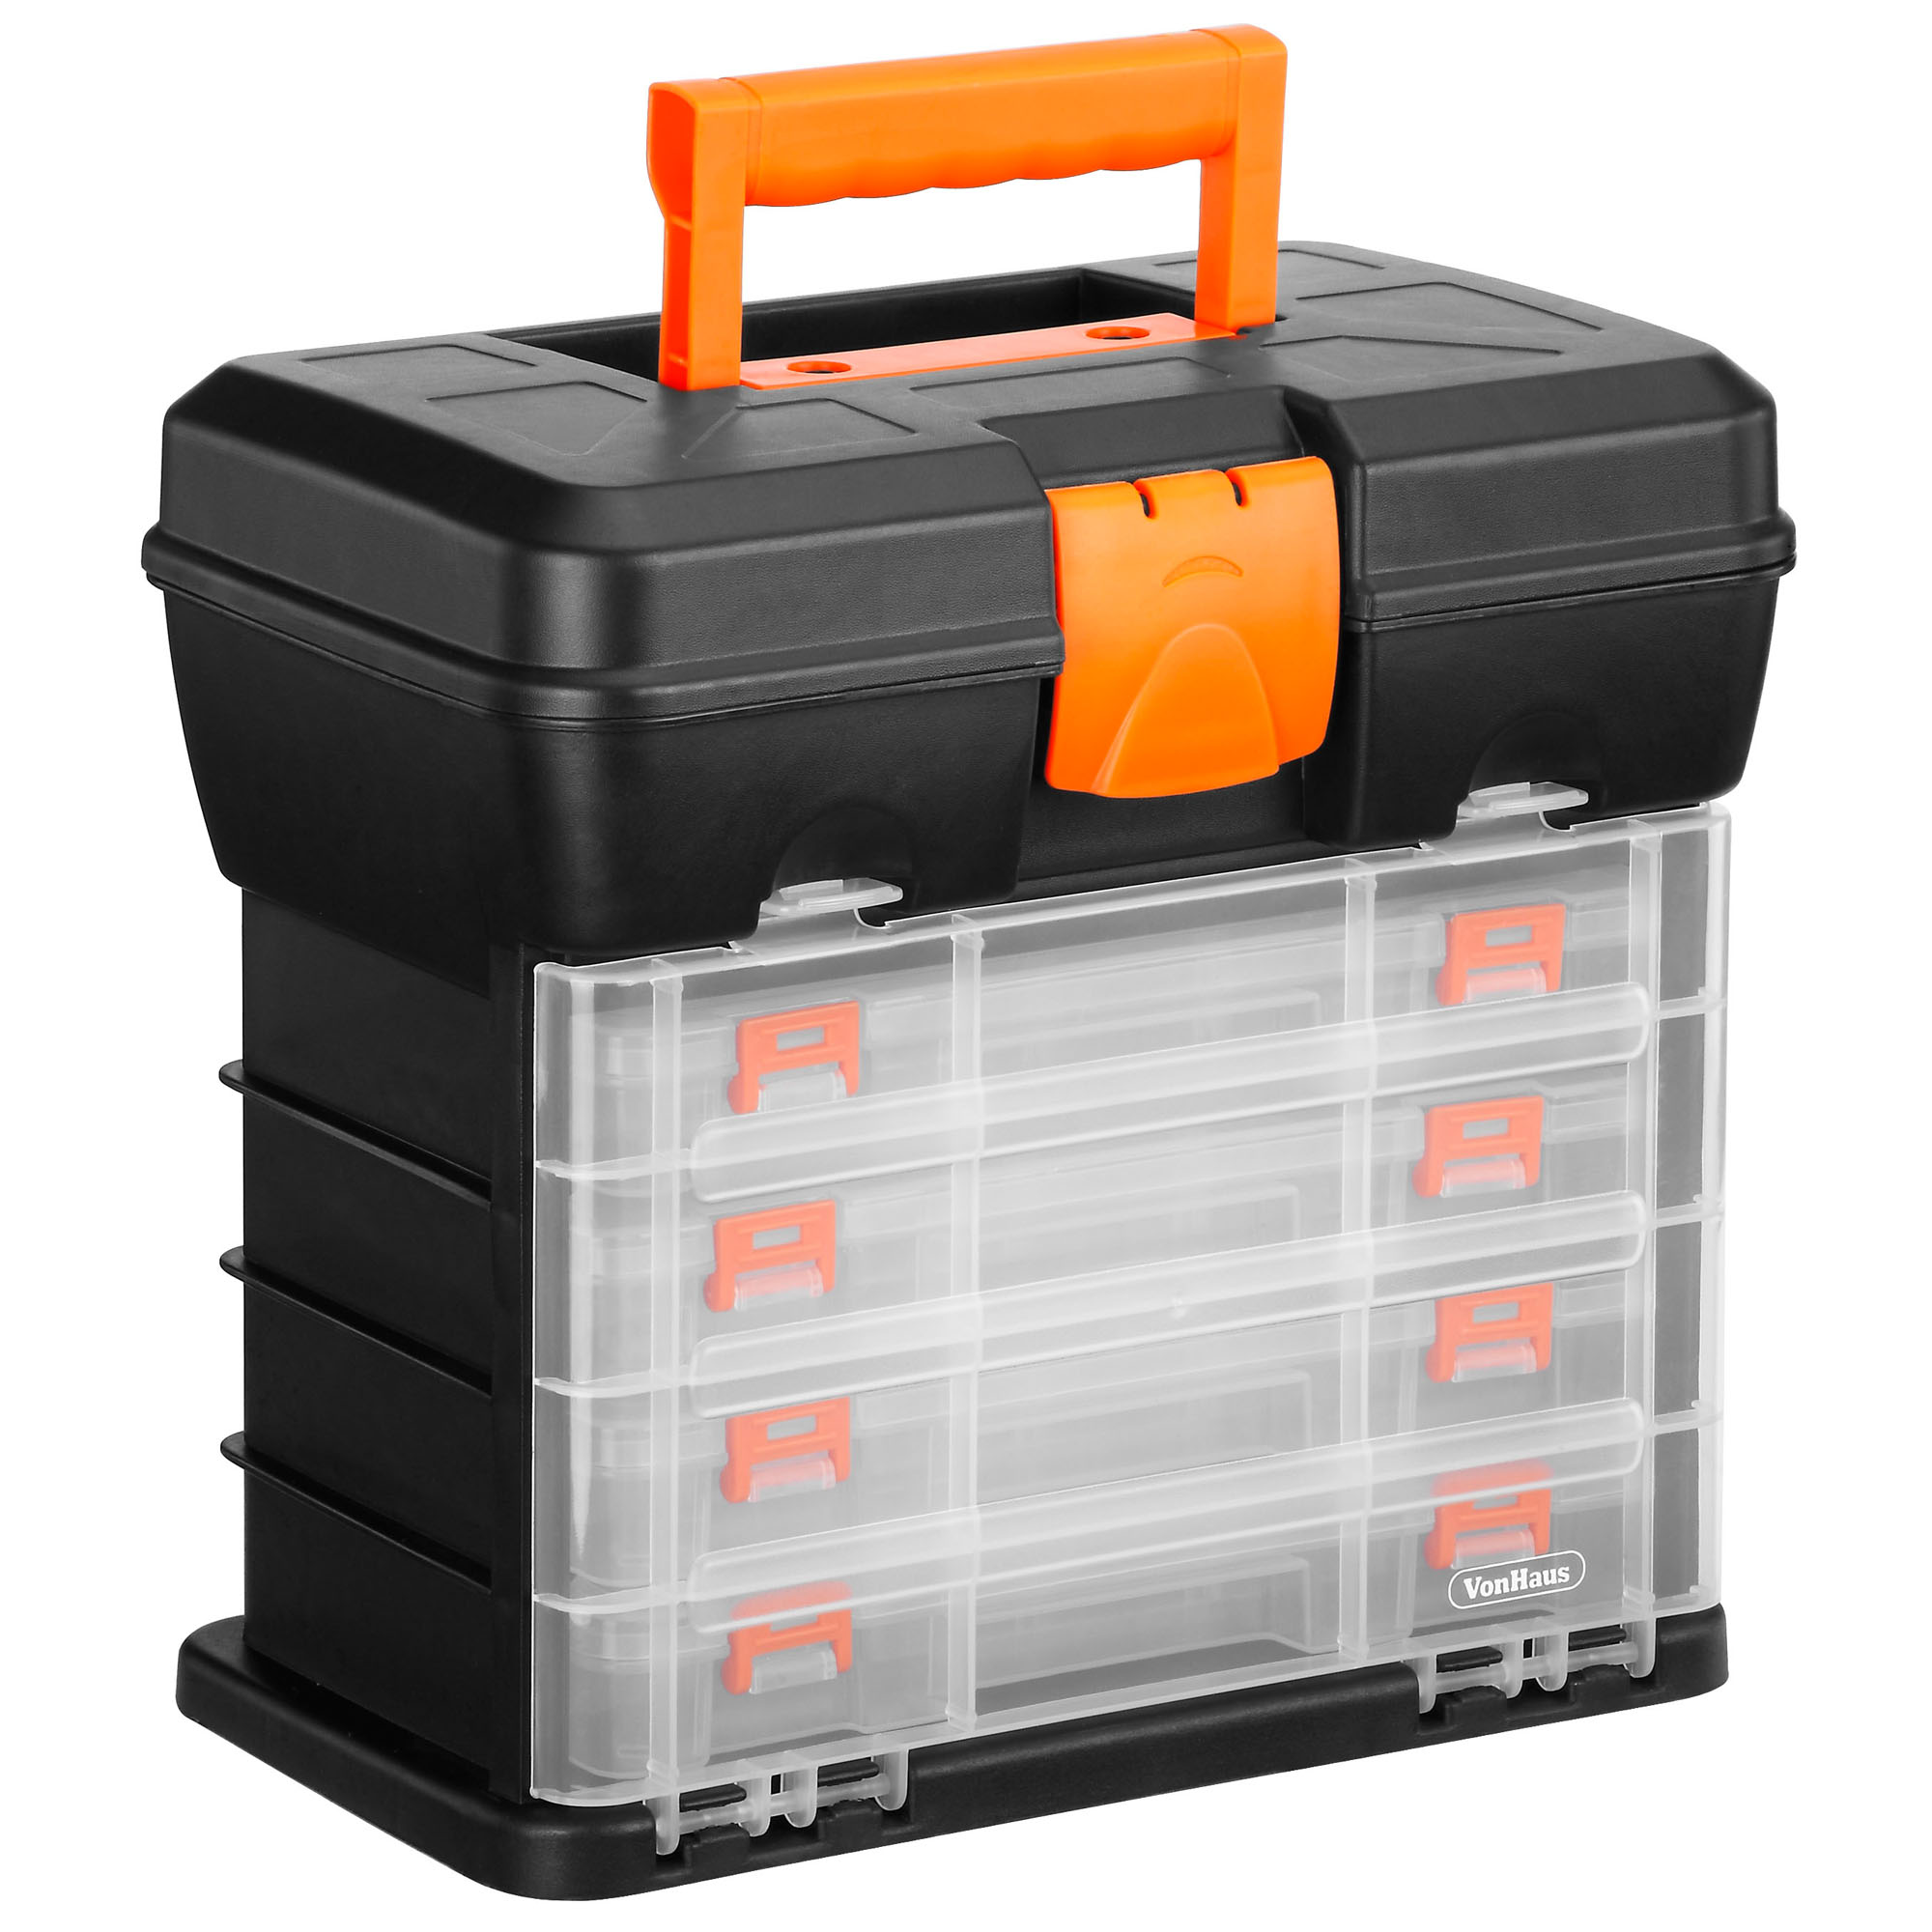 Storage No 2 Utility Storage: VonHaus Utility DIY Storage Tool Box Carry Case